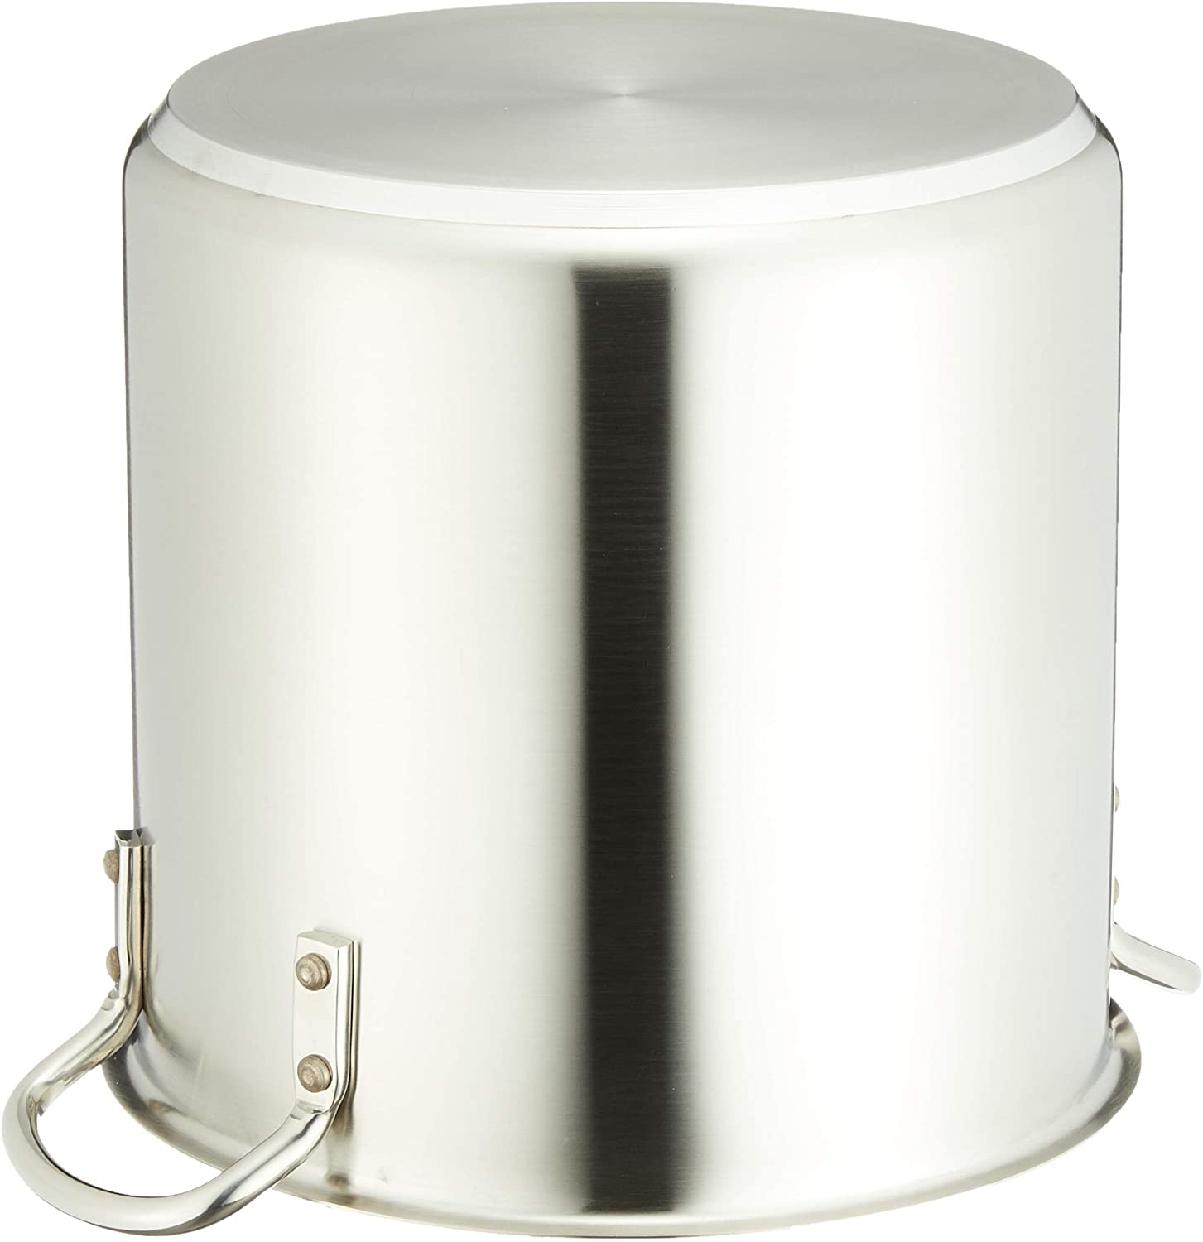 Murano(ムラノ) インダクション  テフロンセレクト 寸胴鍋 (蓋無)24cm 18-8 AZV-78の商品画像2